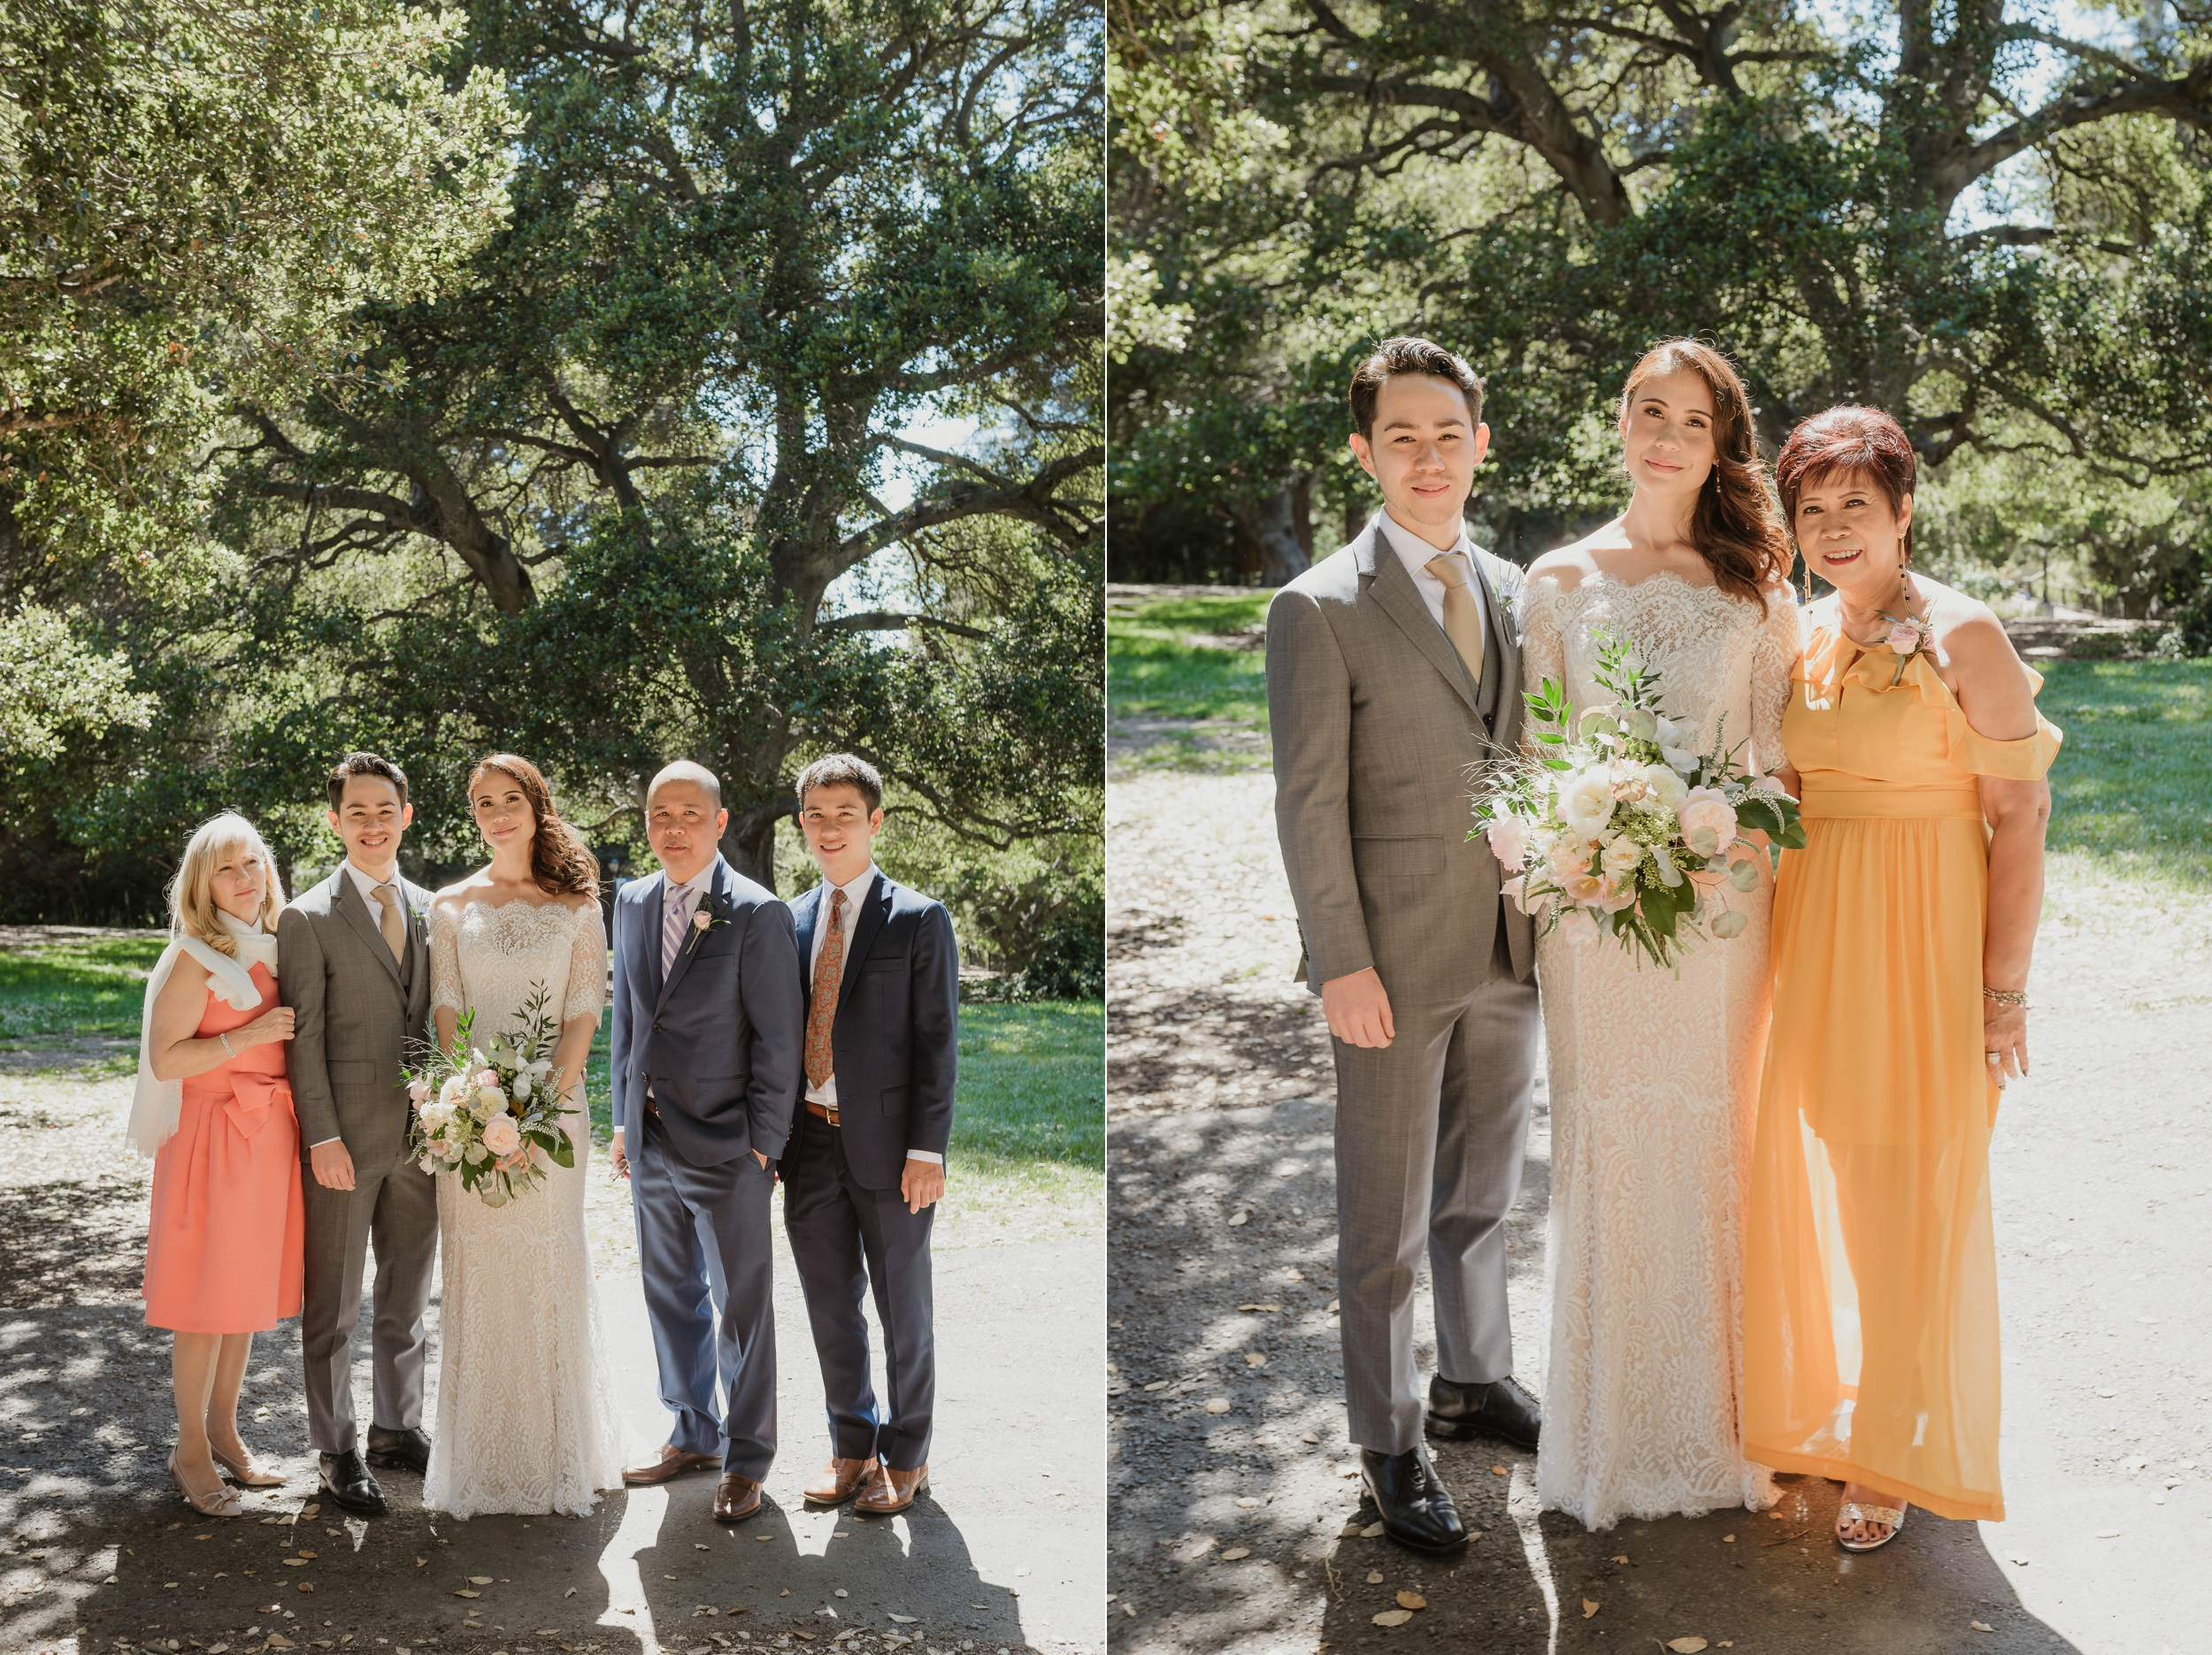 14-berkeley-uc-faculty-club-wedding-kb-vivianchen-101_WEB.jpg